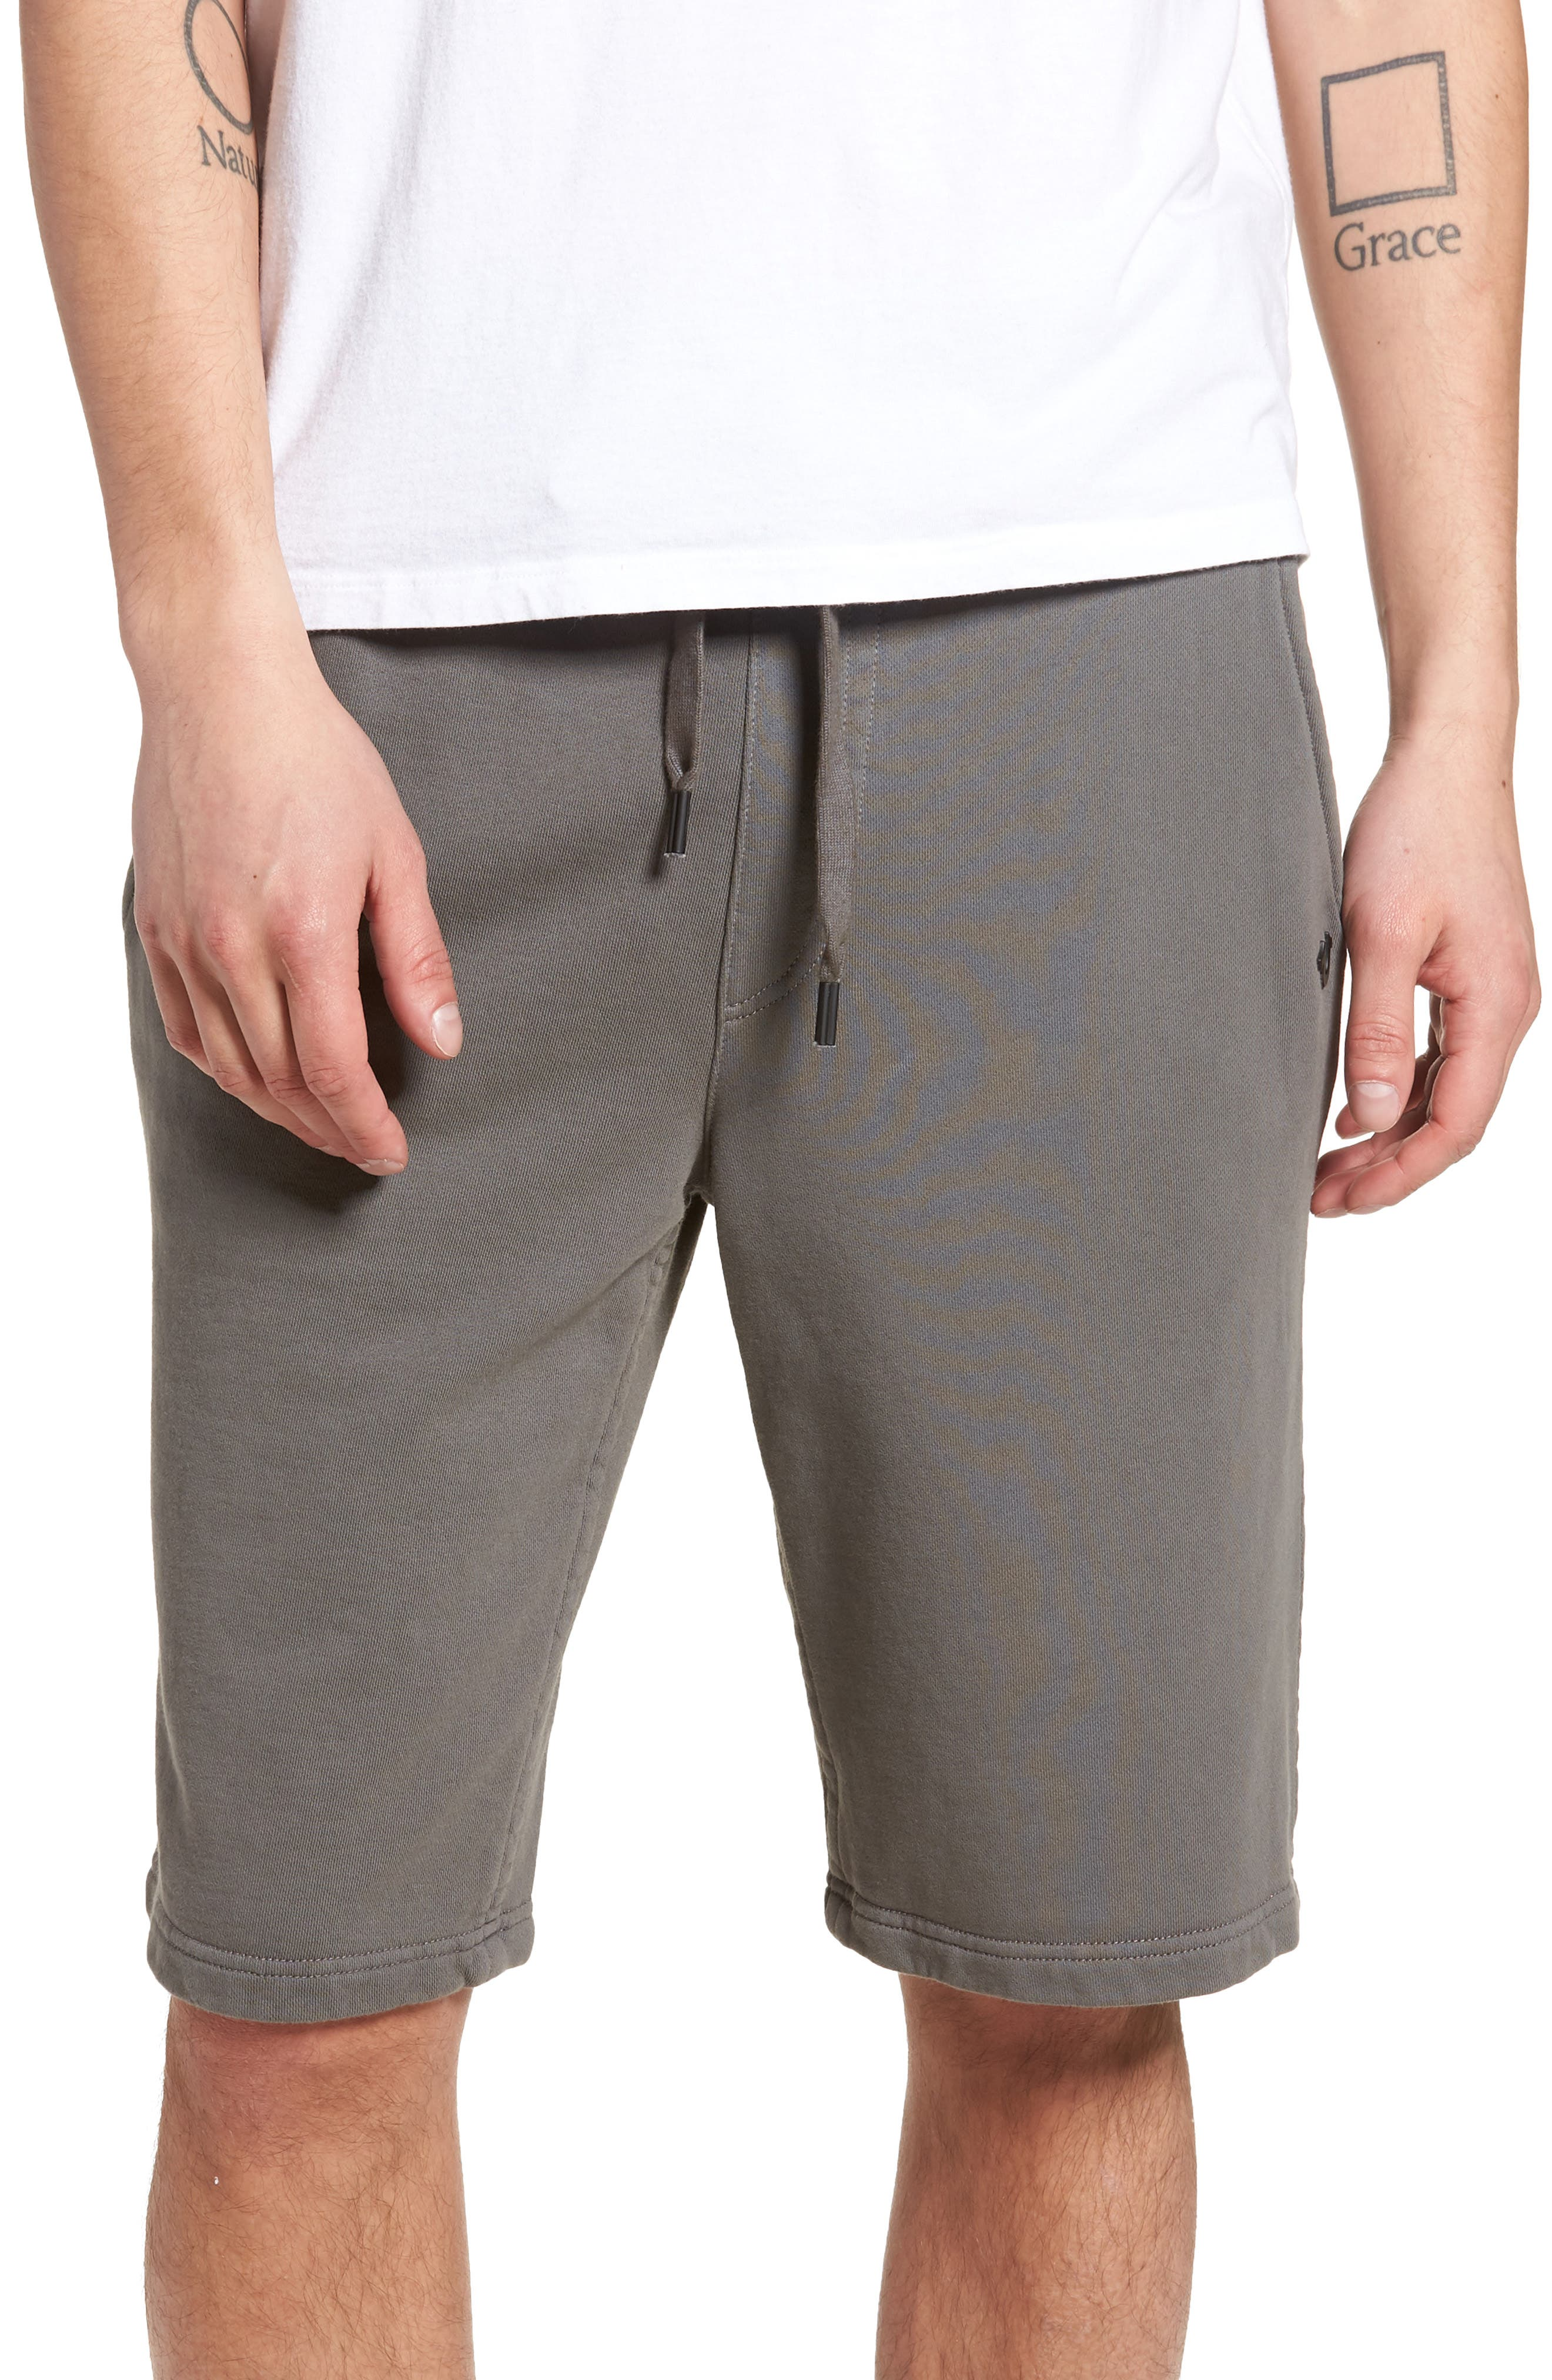 Core Shorts,                             Main thumbnail 1, color,                             CHARCOAL